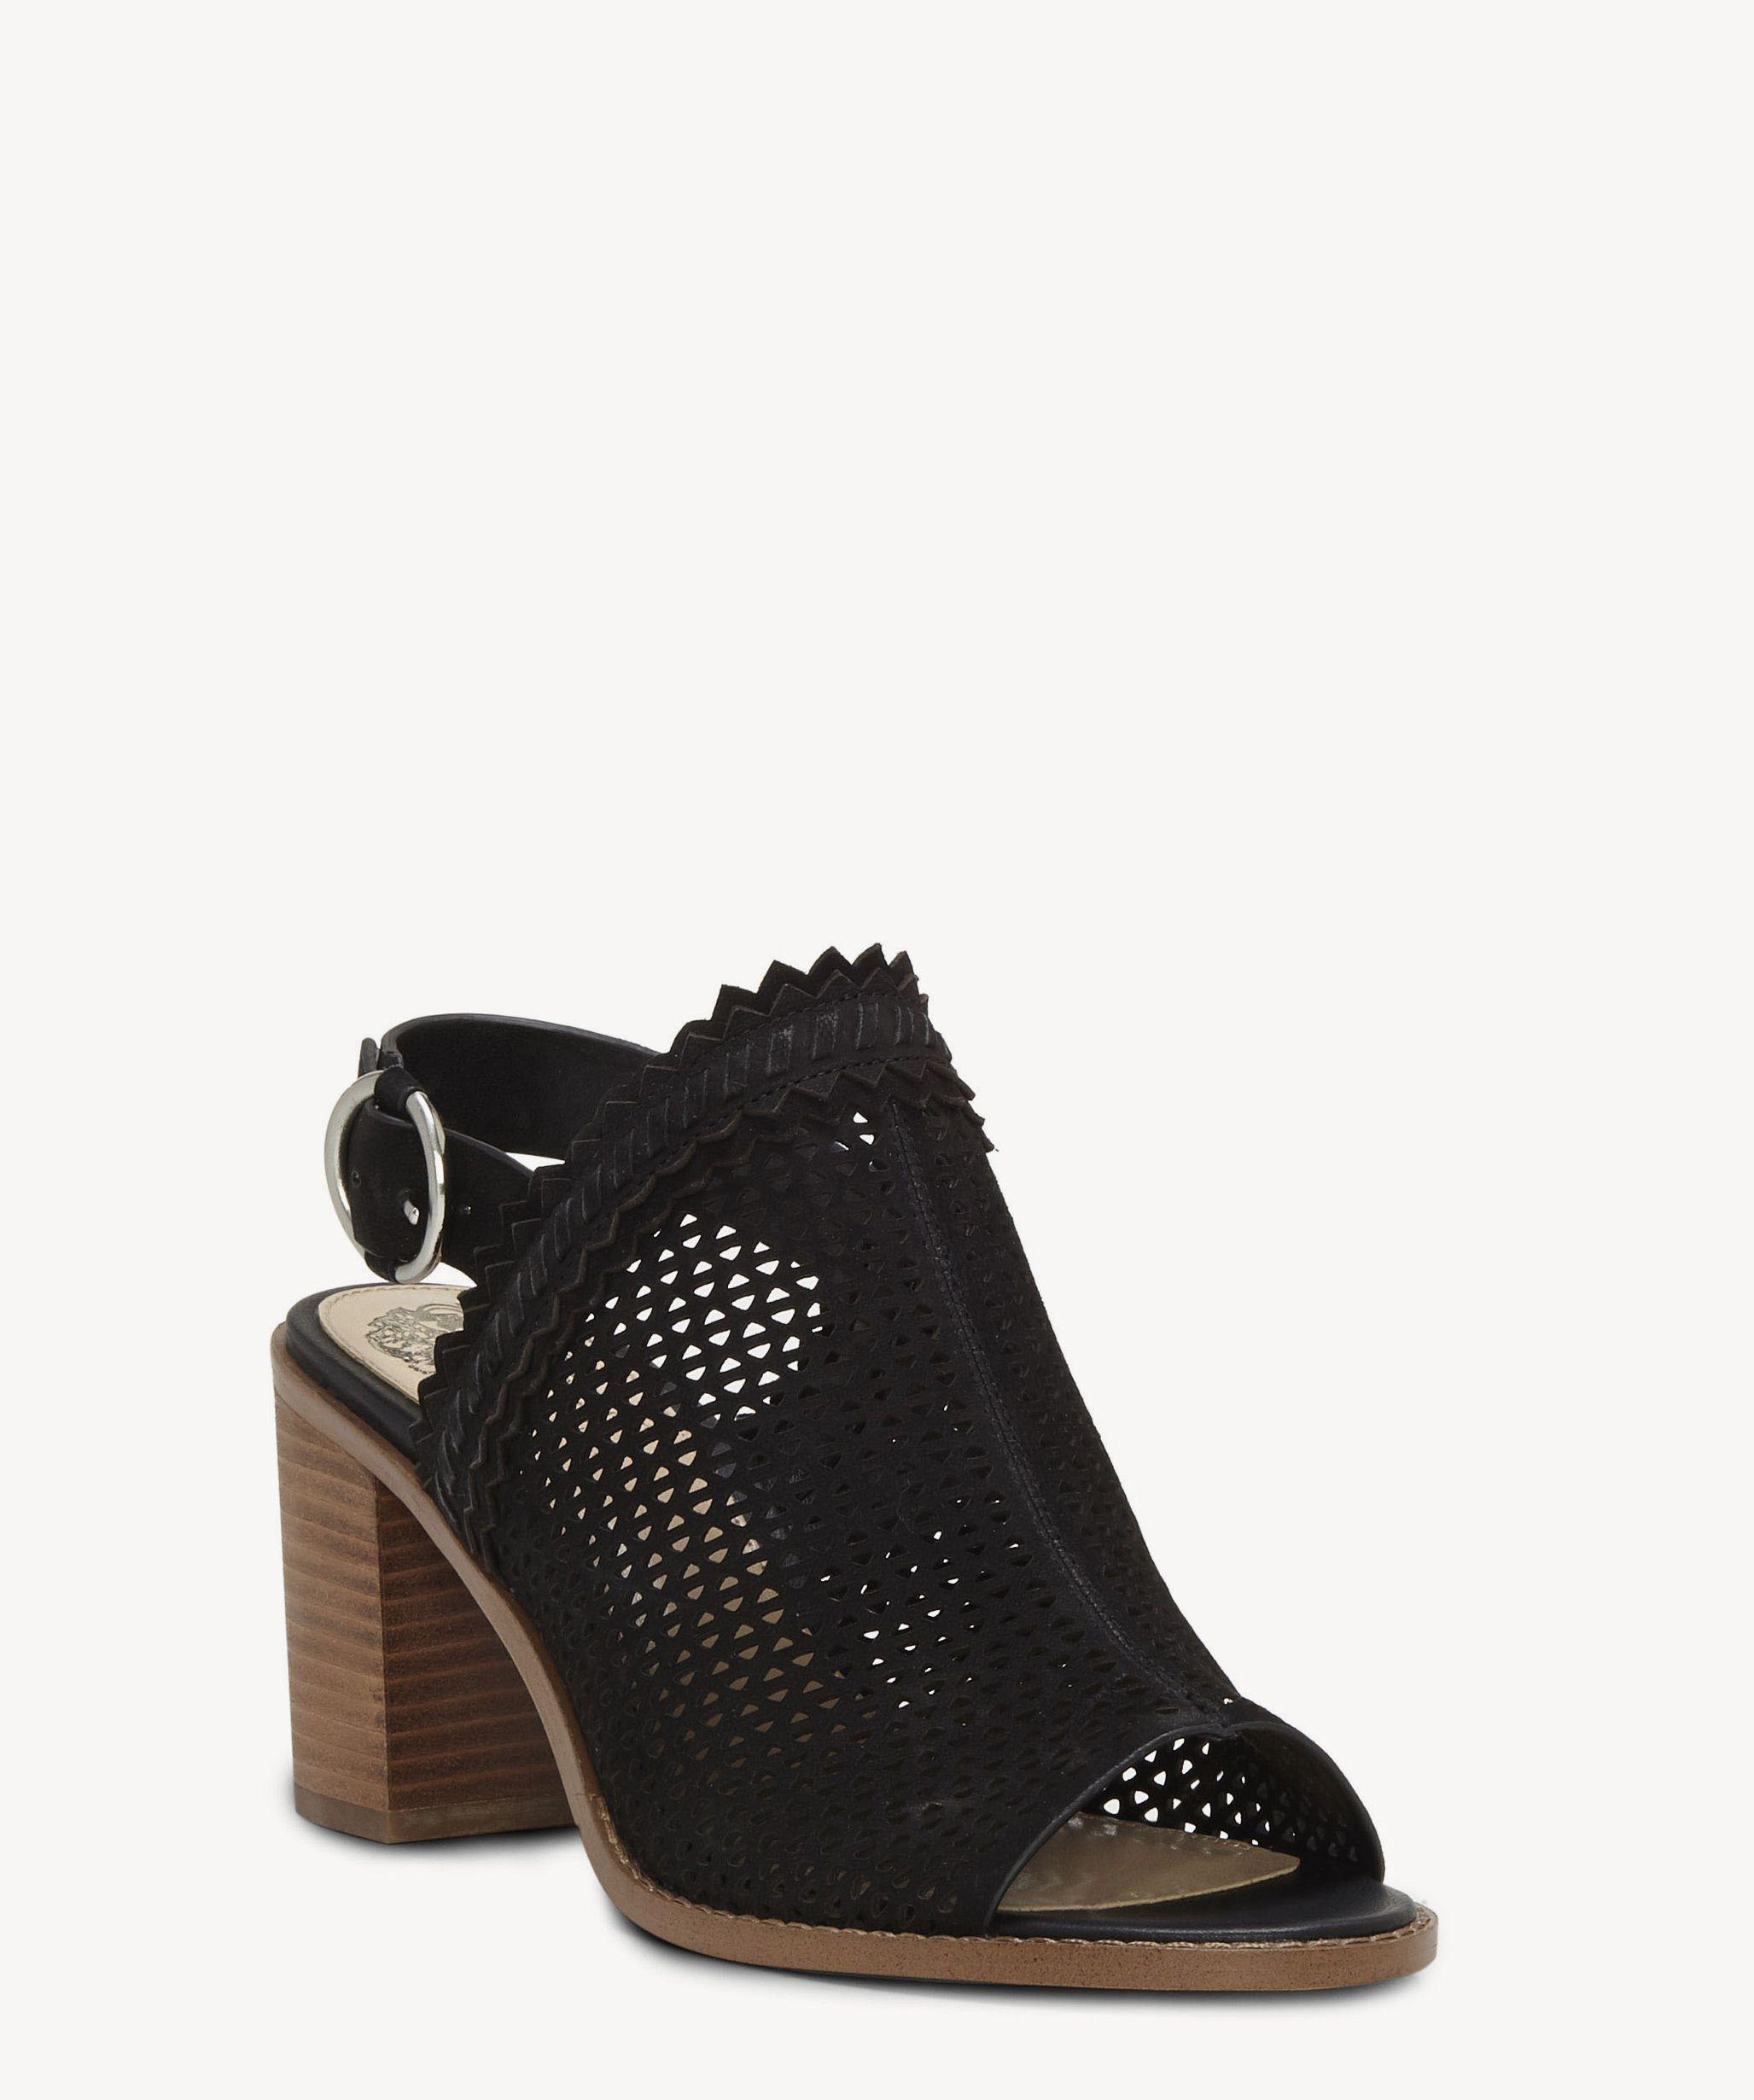 c6e0b2c455f Lyst - Vince Camuto Tricinda Slingback Block Heel Sandal in Black ...